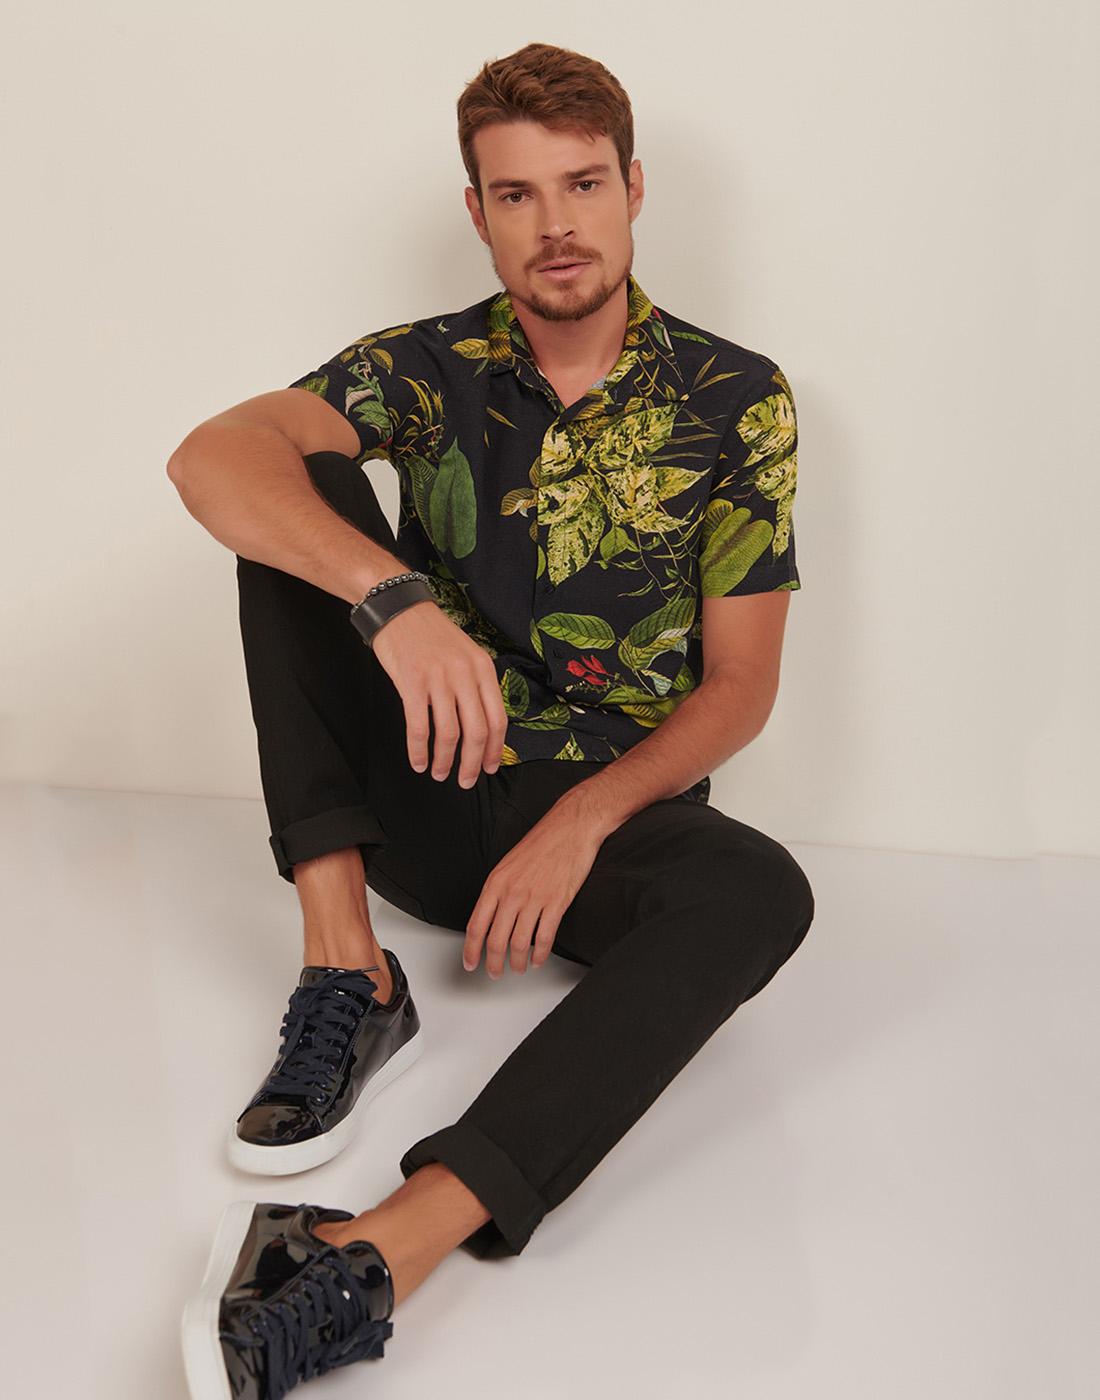 Camisa Masc. Manga Curta Slim Fit Estampada Floral Six One